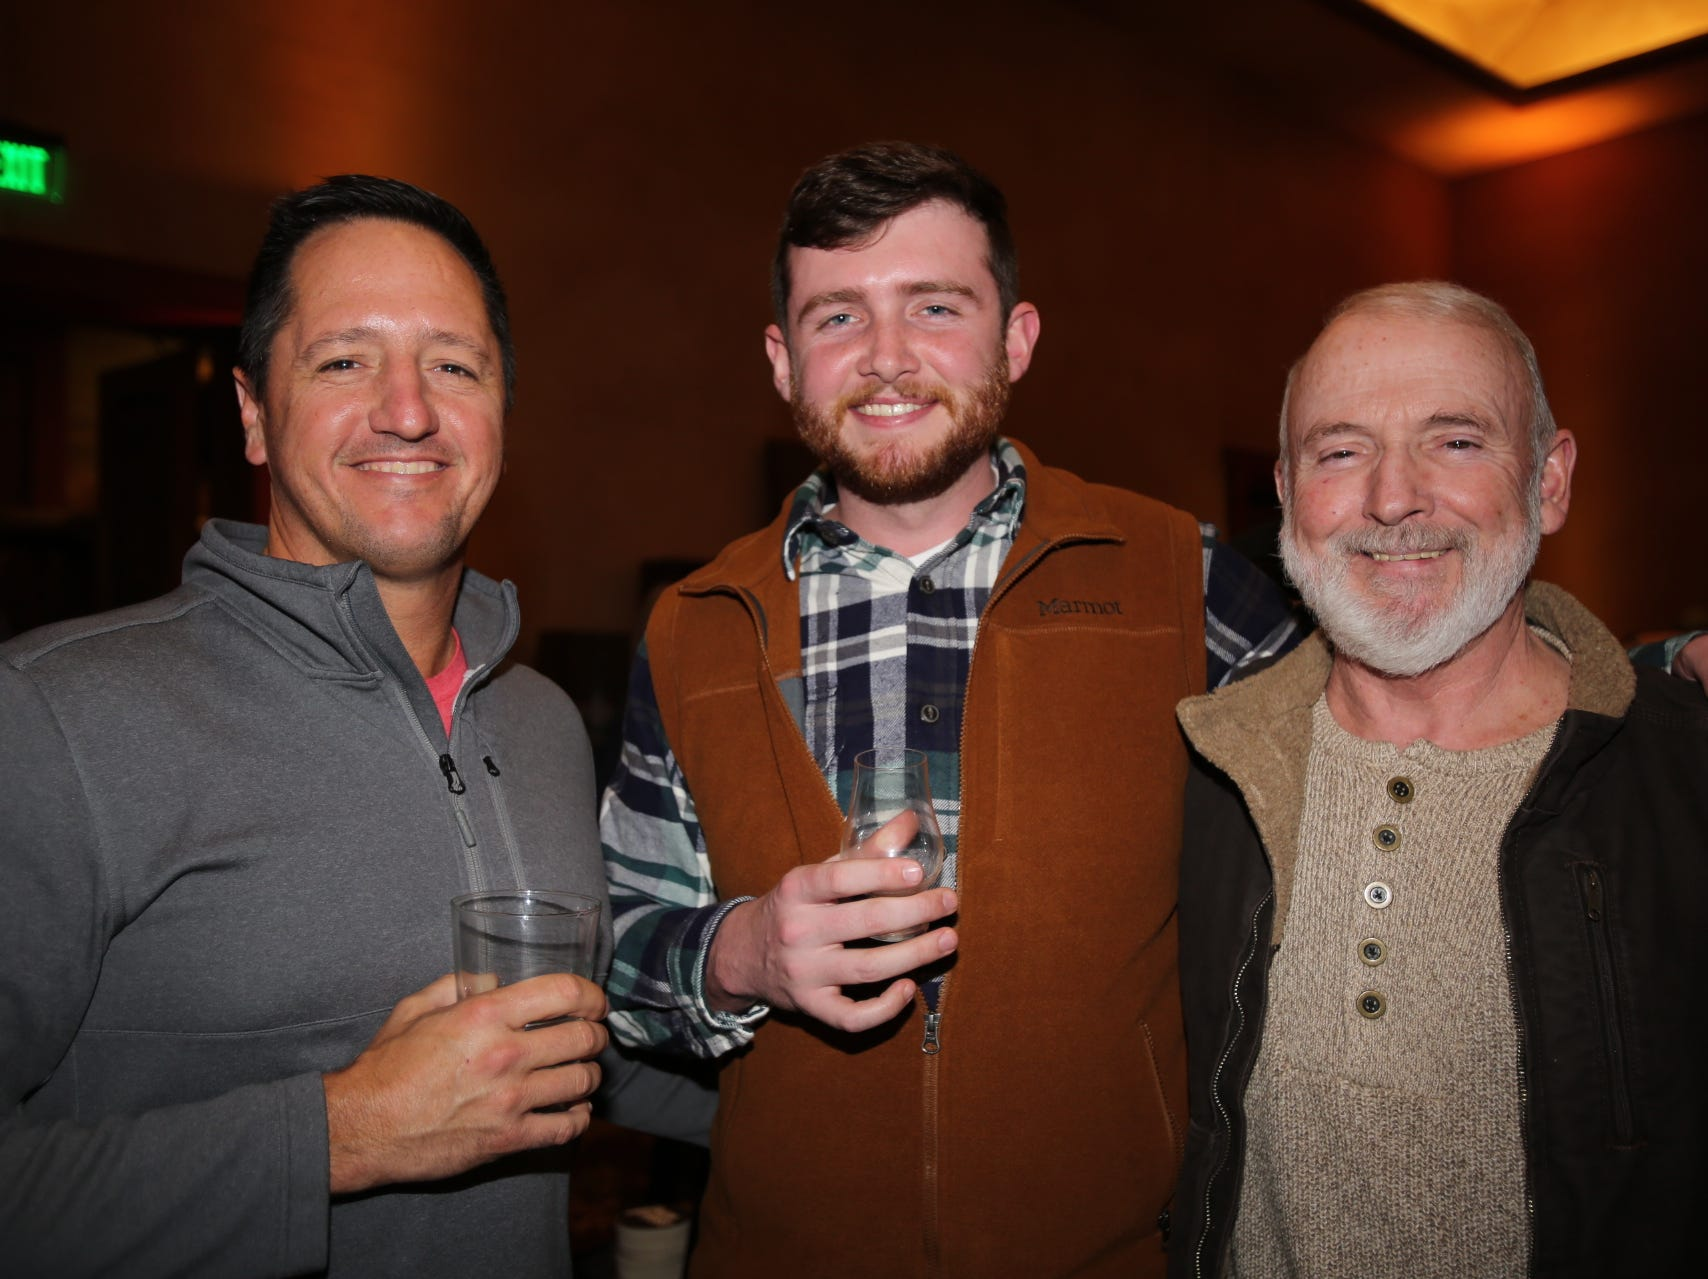 Daniel Scott, Hunter and Dan Earnest